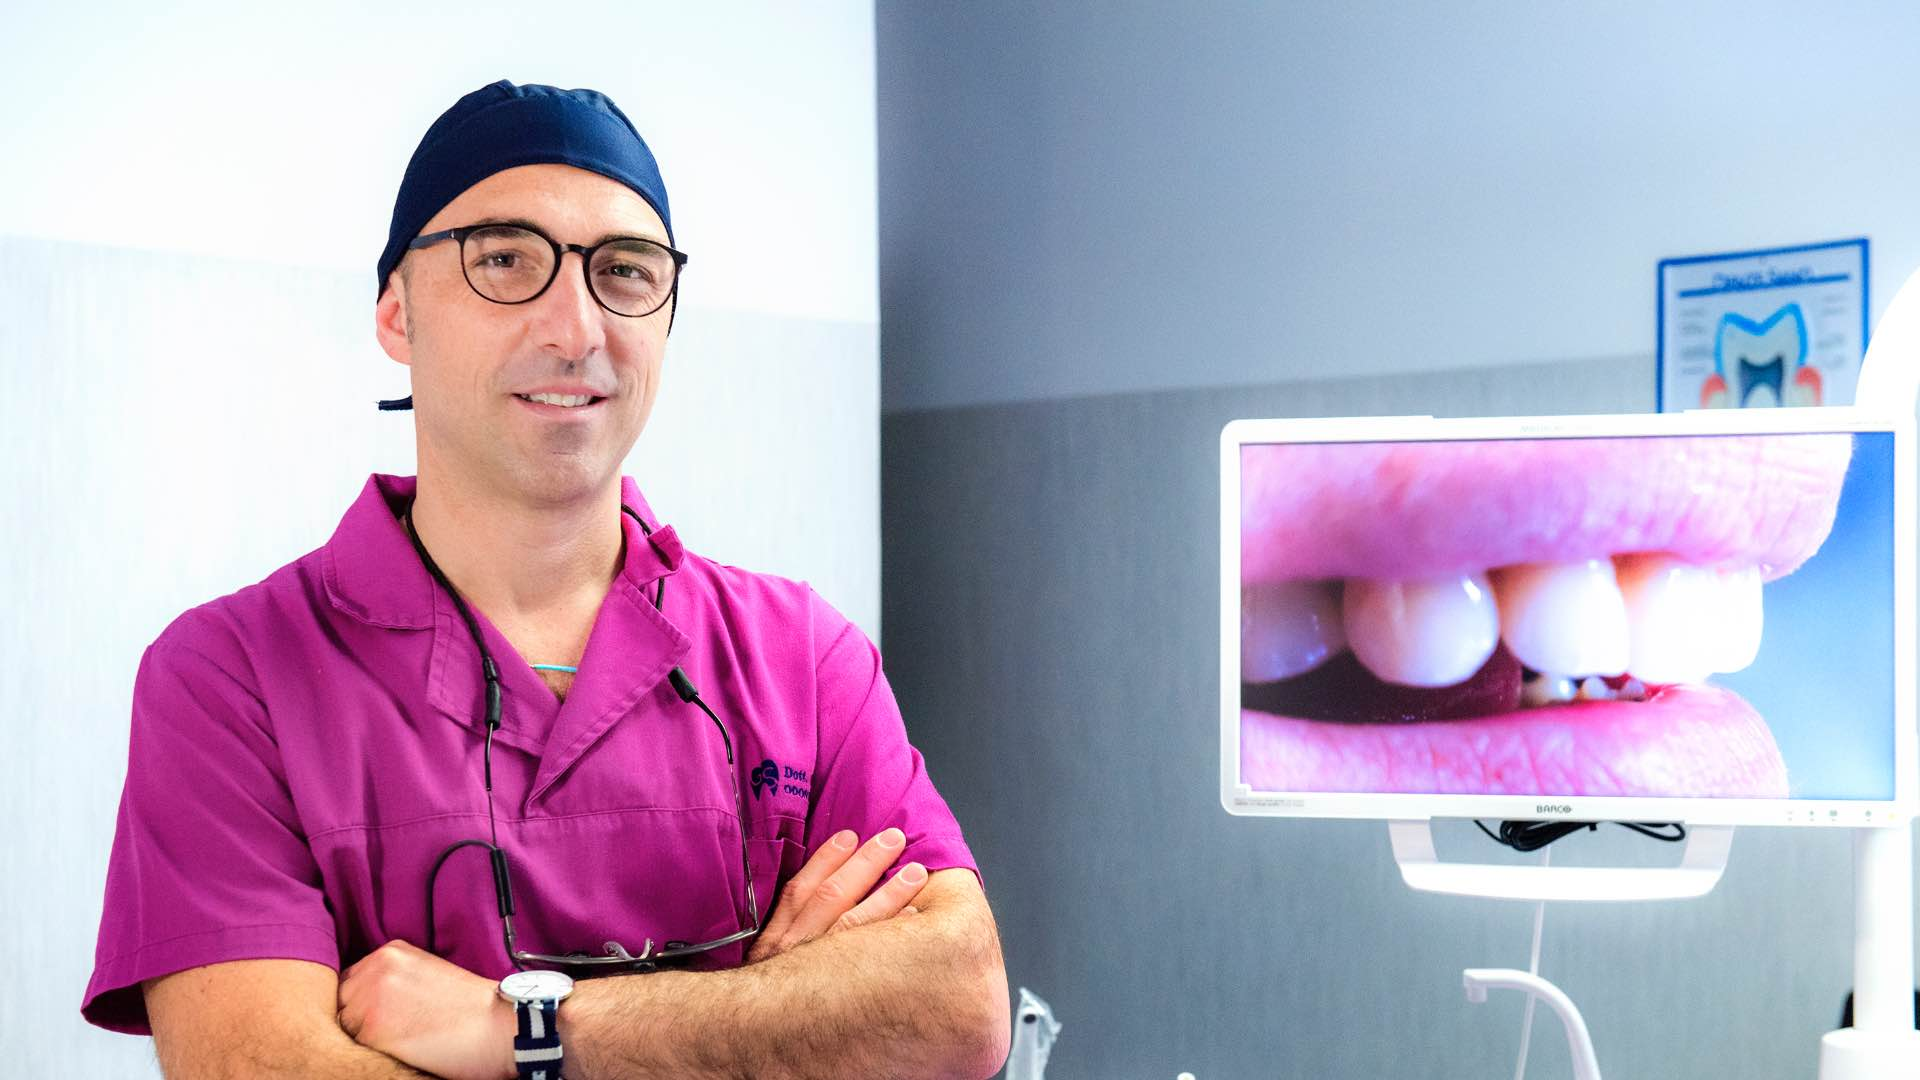 Studio dentistico Spinosa 37 | Dentista a Gaeta